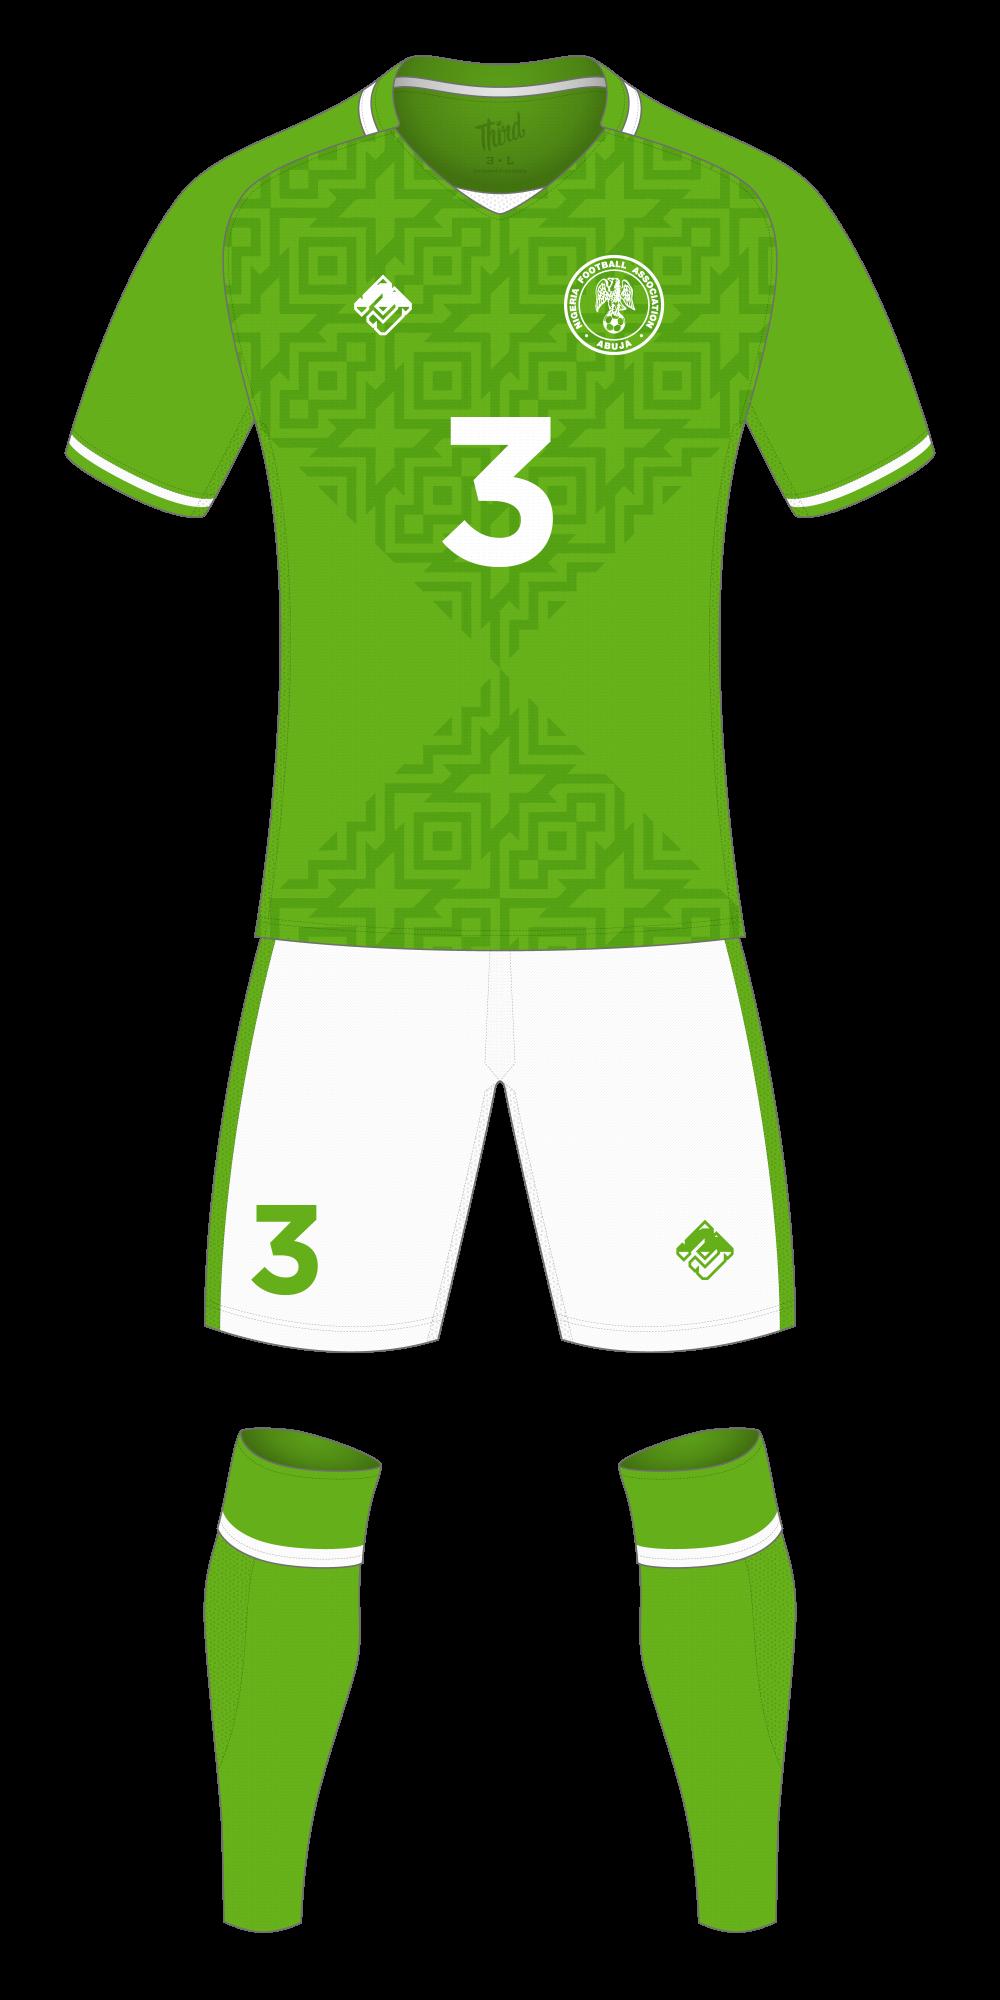 Nigeria World Cup 2018 concept